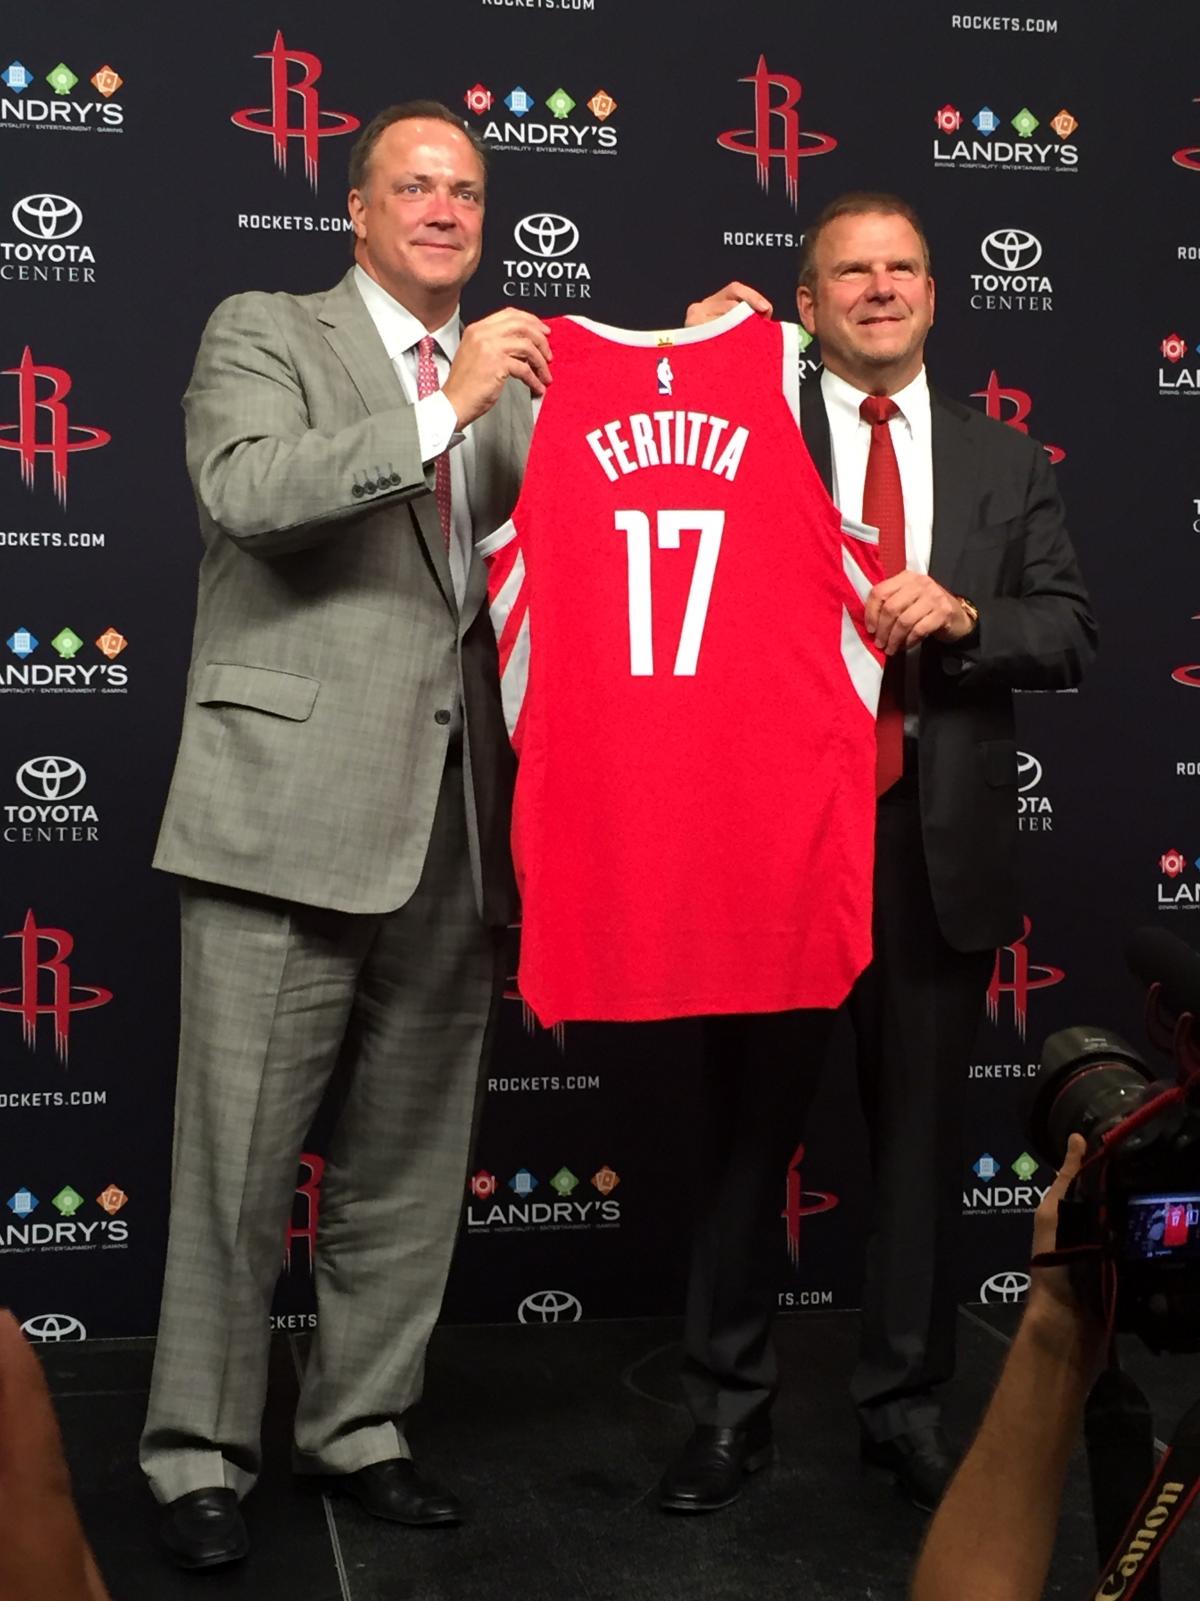 Houston, Rockets CEO Tad Brown and owner Tilman Fertitta, Oct 2017